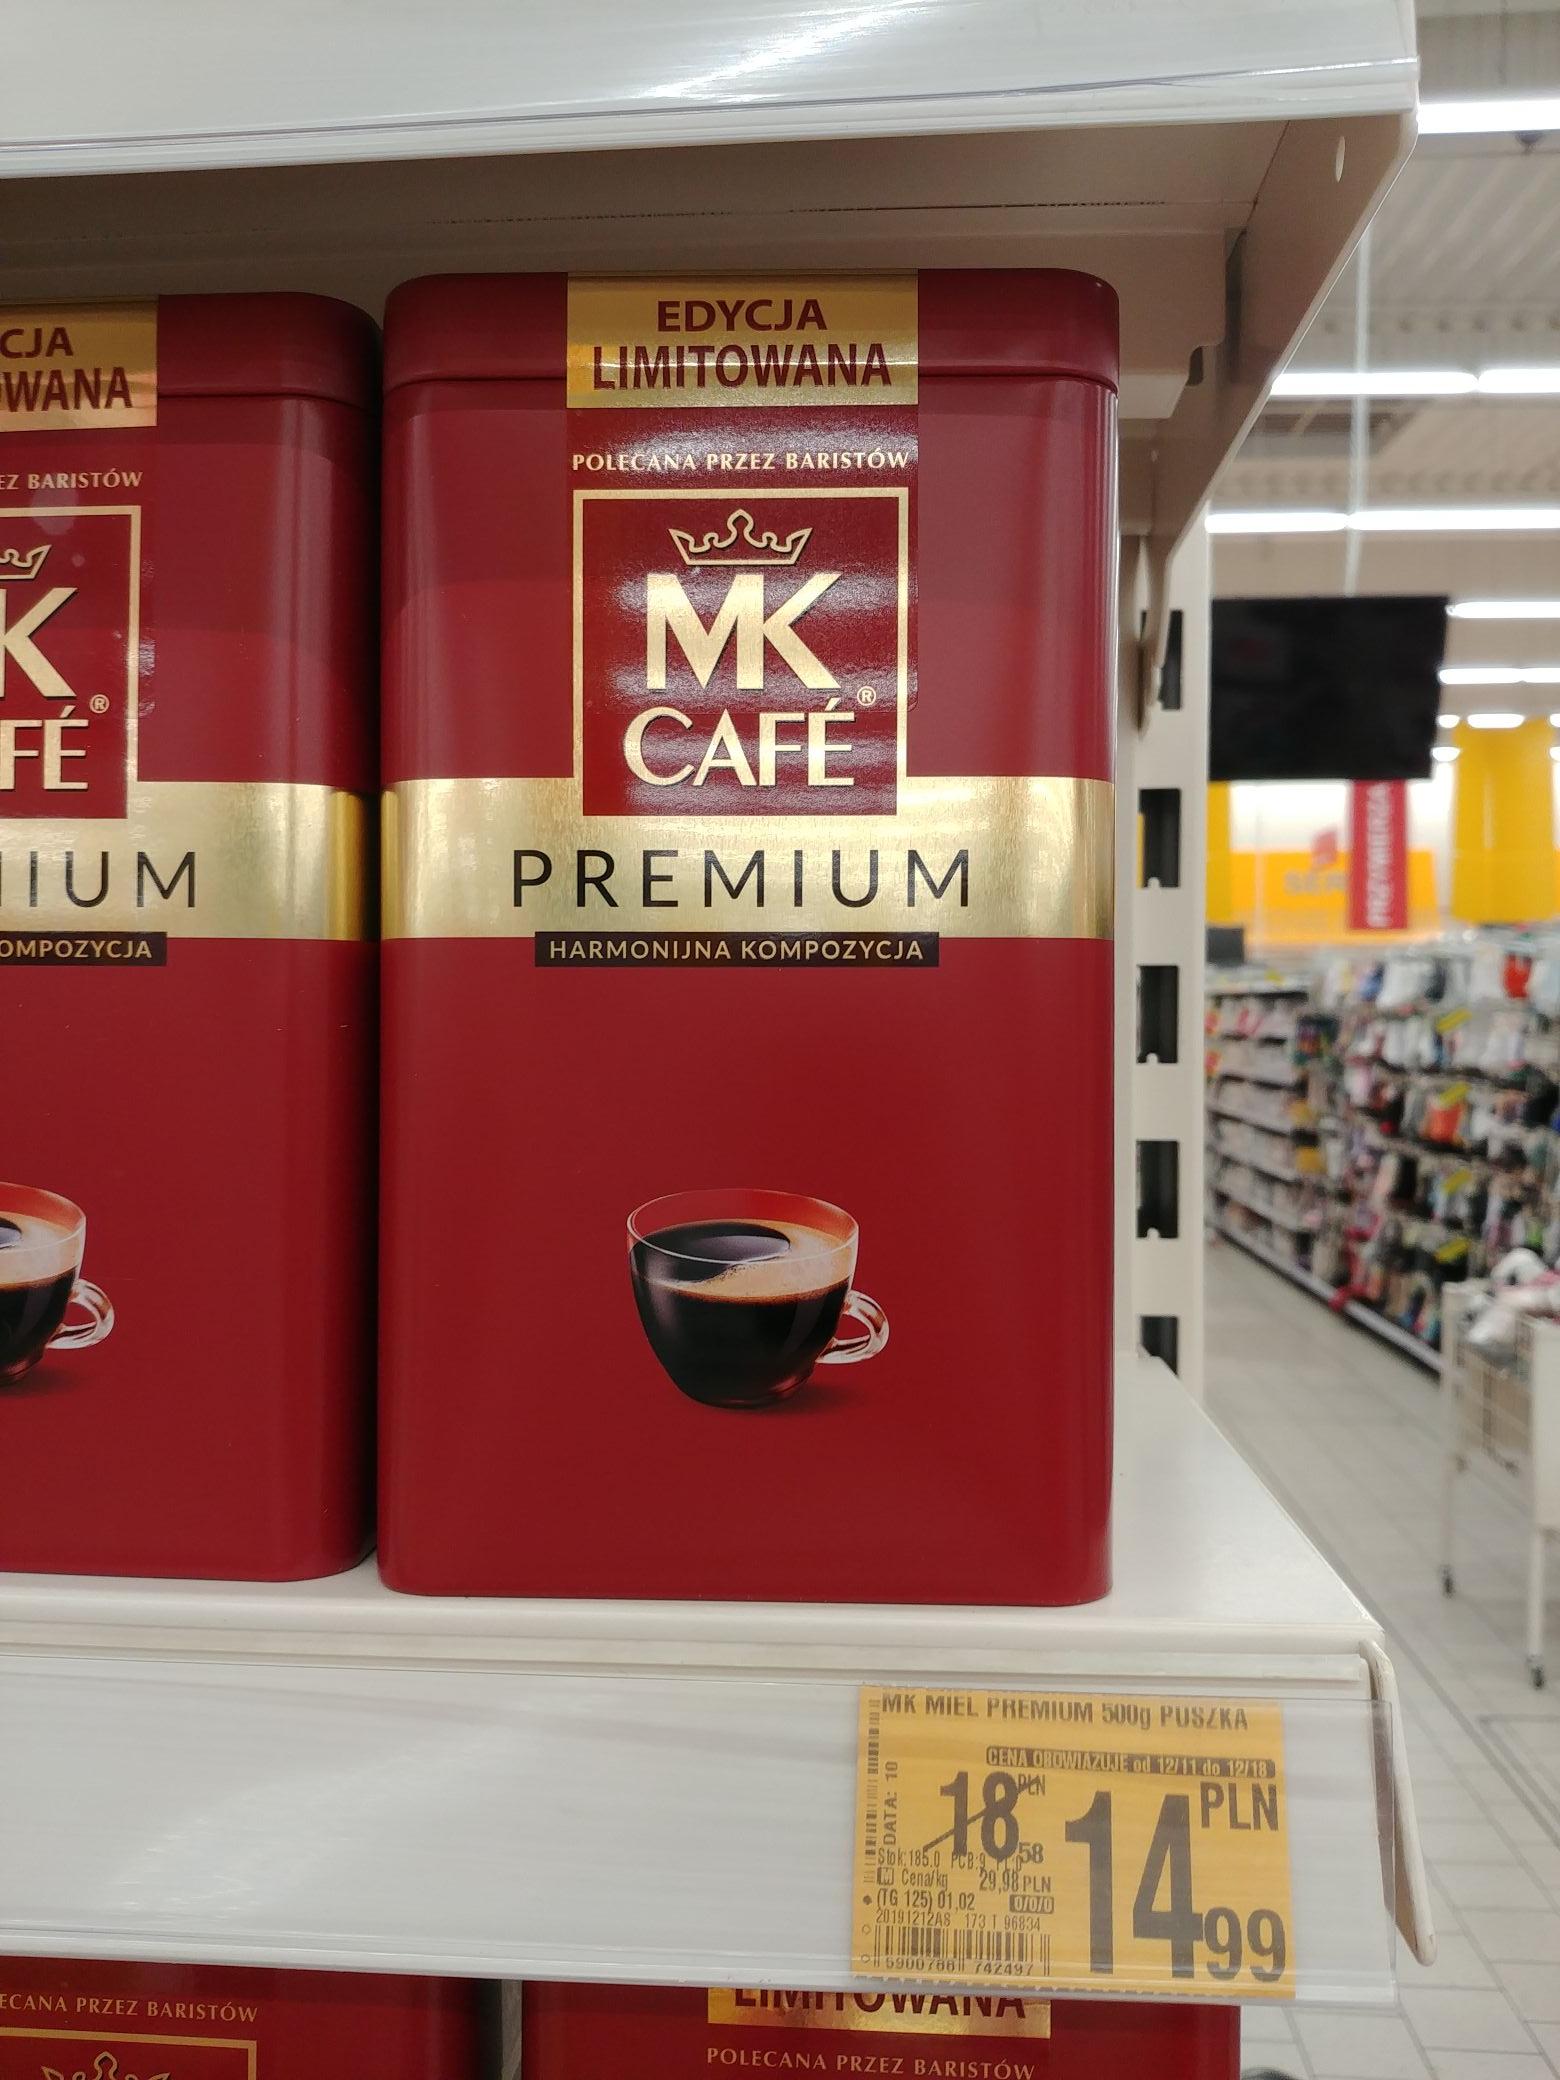 Kawa MK Cafe premium mielona 500g -metalowa puszka @Auchan